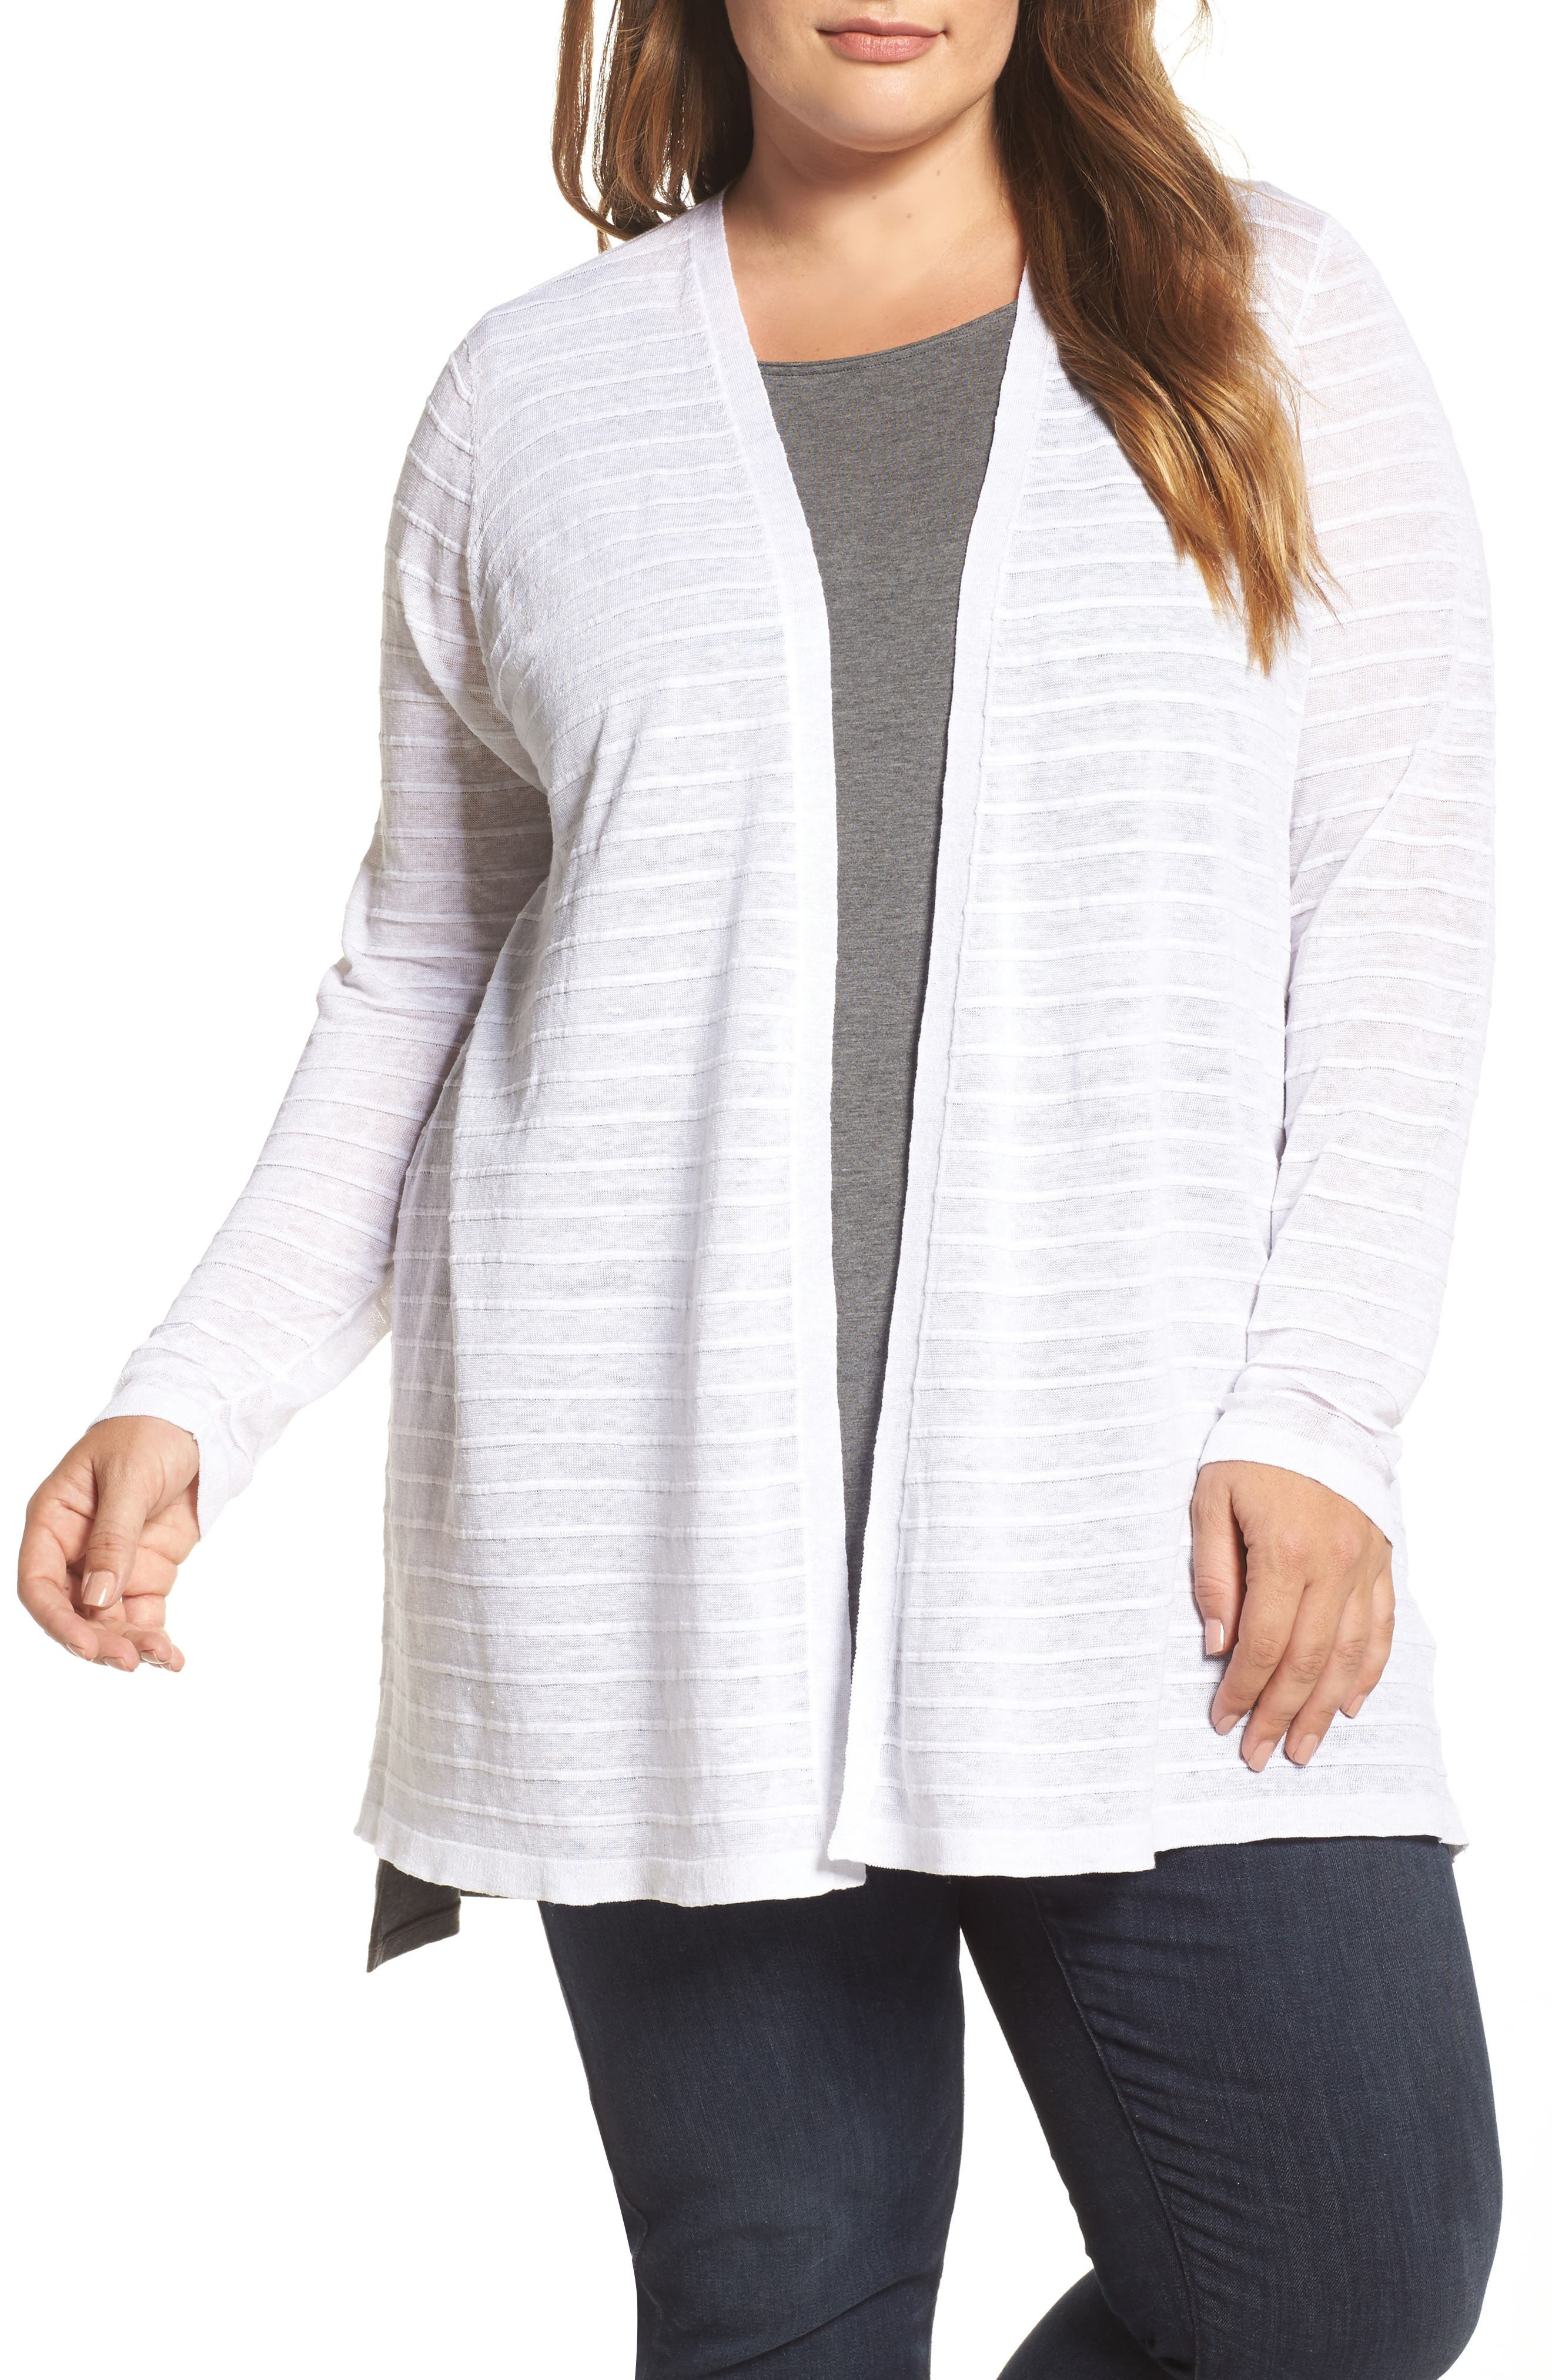 Shadow Stripe Organic Linen Cardigan,                             Main thumbnail 1, color,                             White